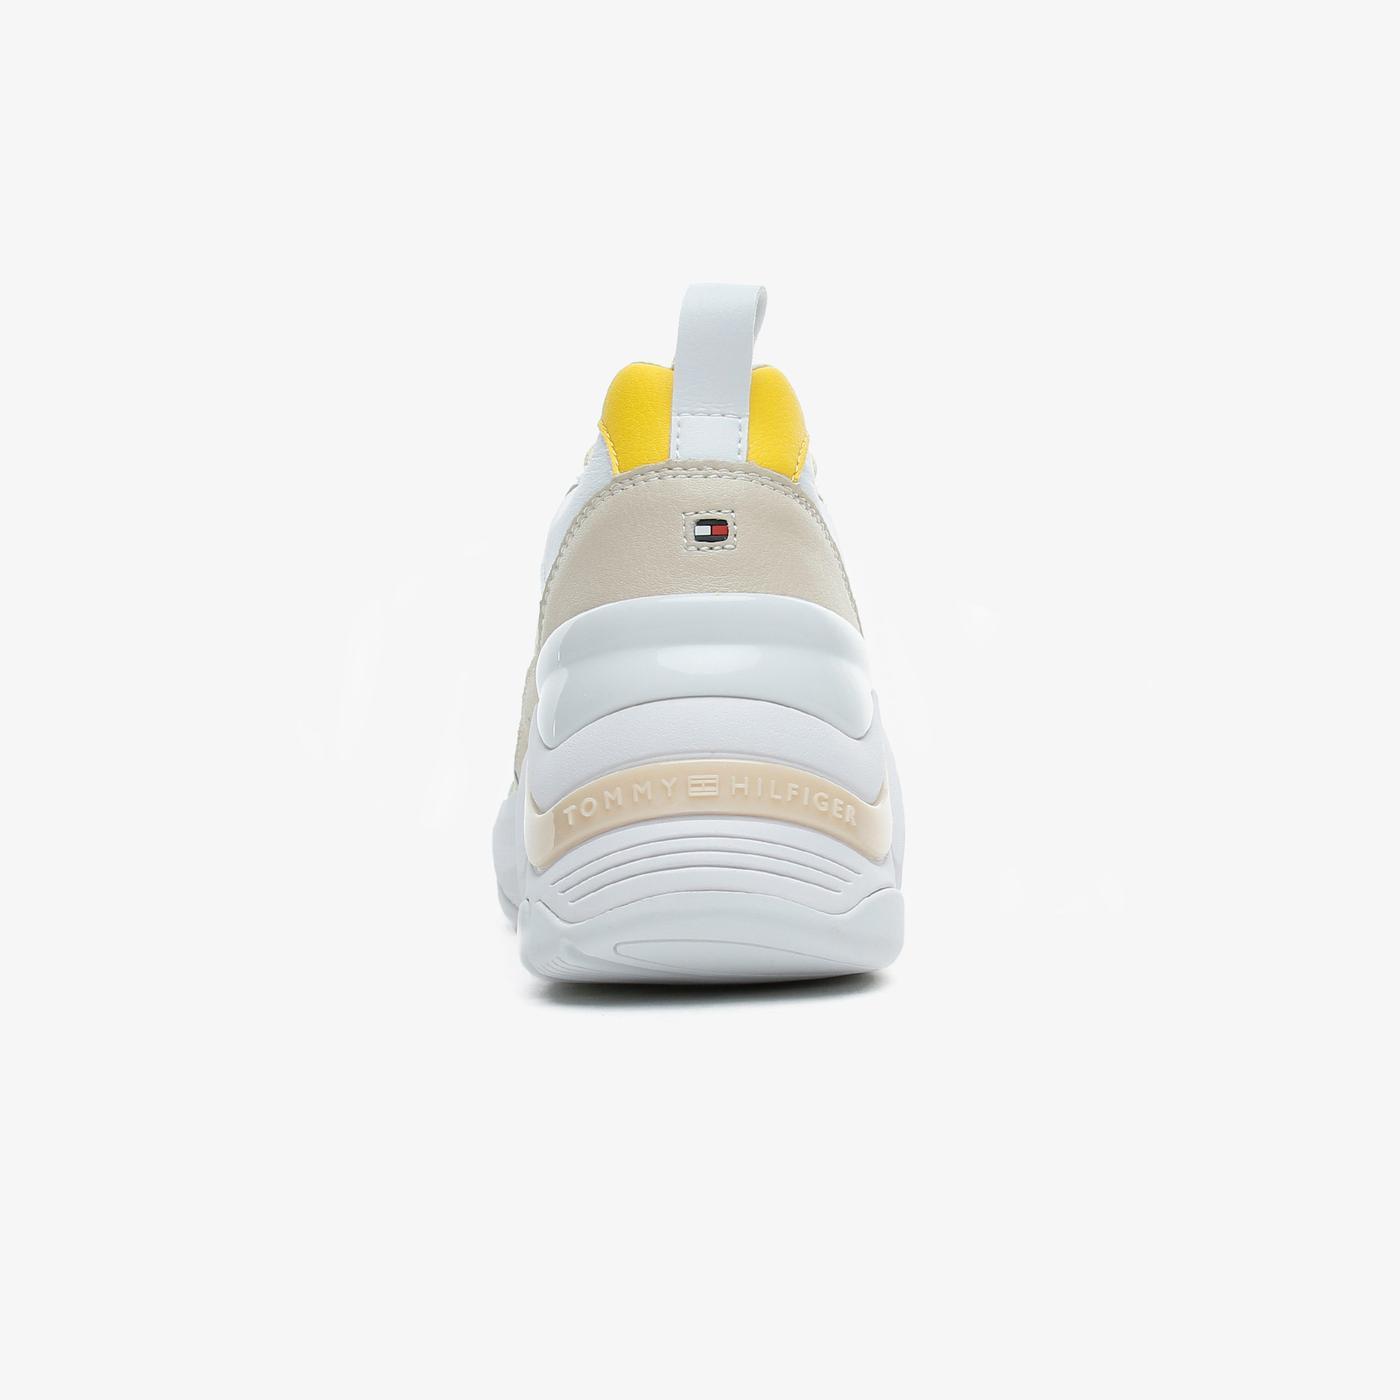 Tommy Hilfiger Fashion Wedge Kadın Krem Spor Ayakkabı